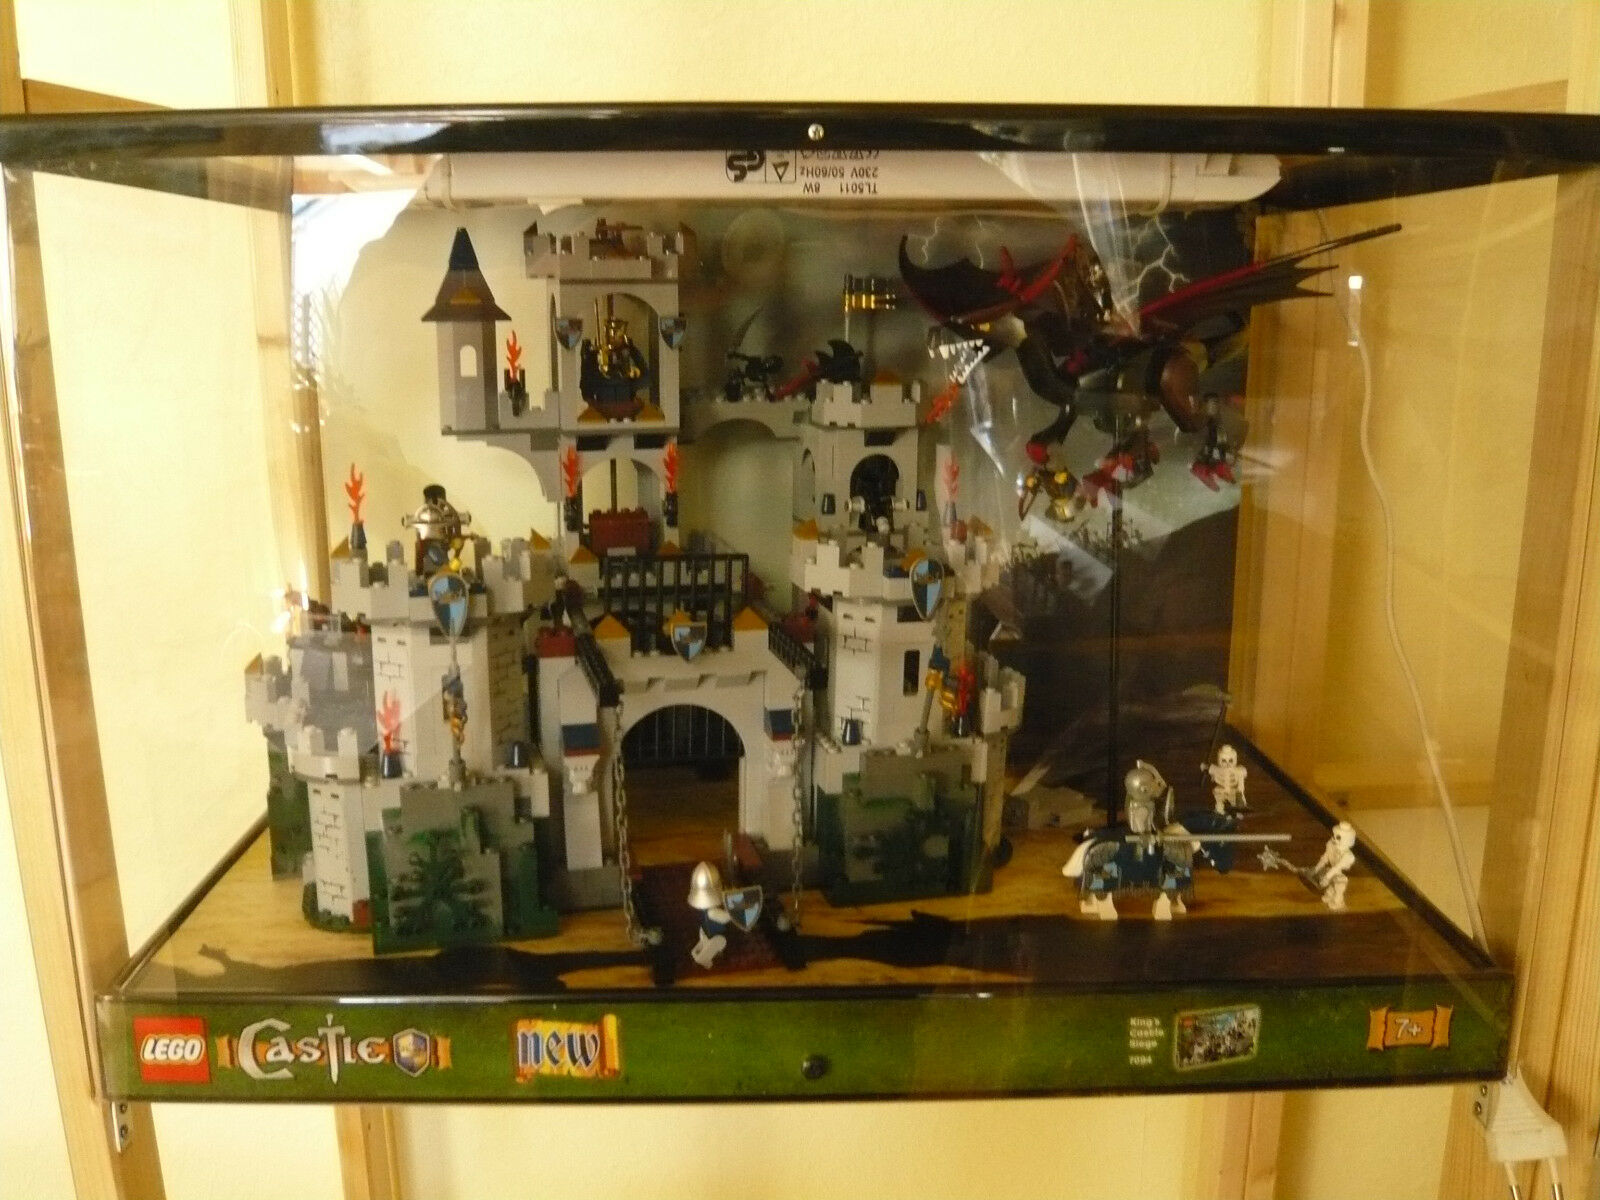 LEGO - Schaukasten - CASTLE NEW - Art.7094 - Showcase